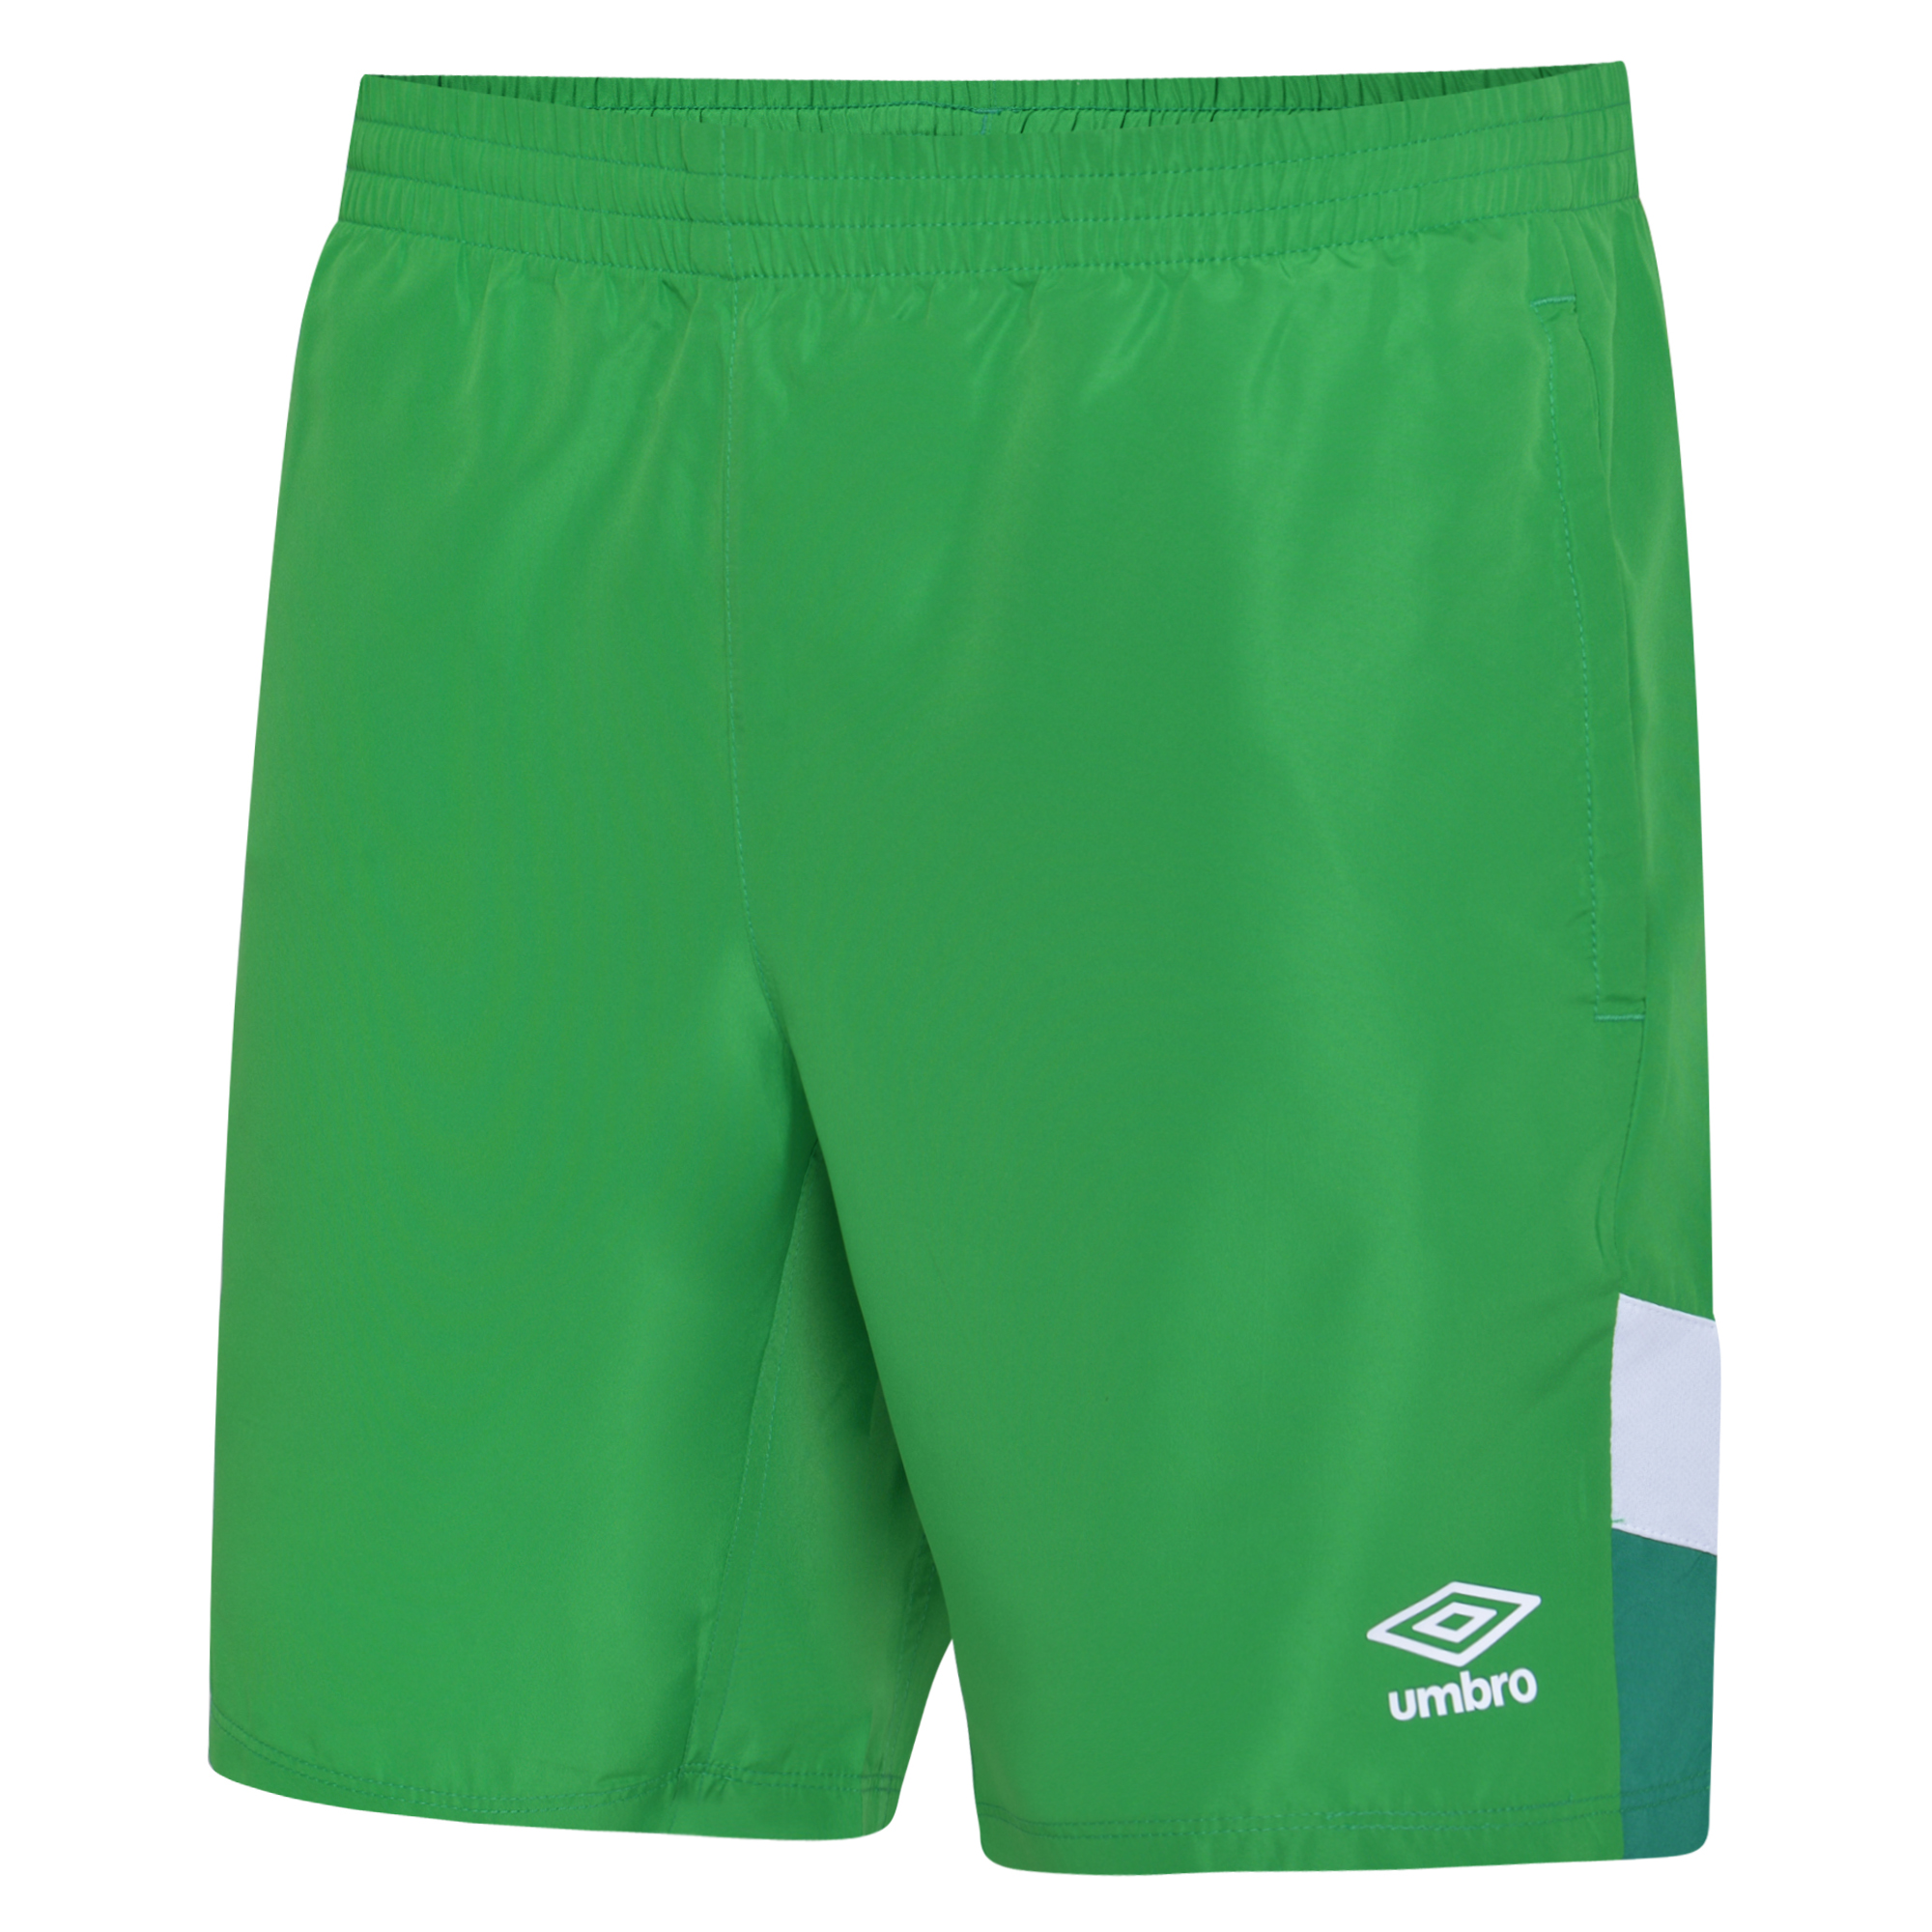 umbro shorts with zip pockets